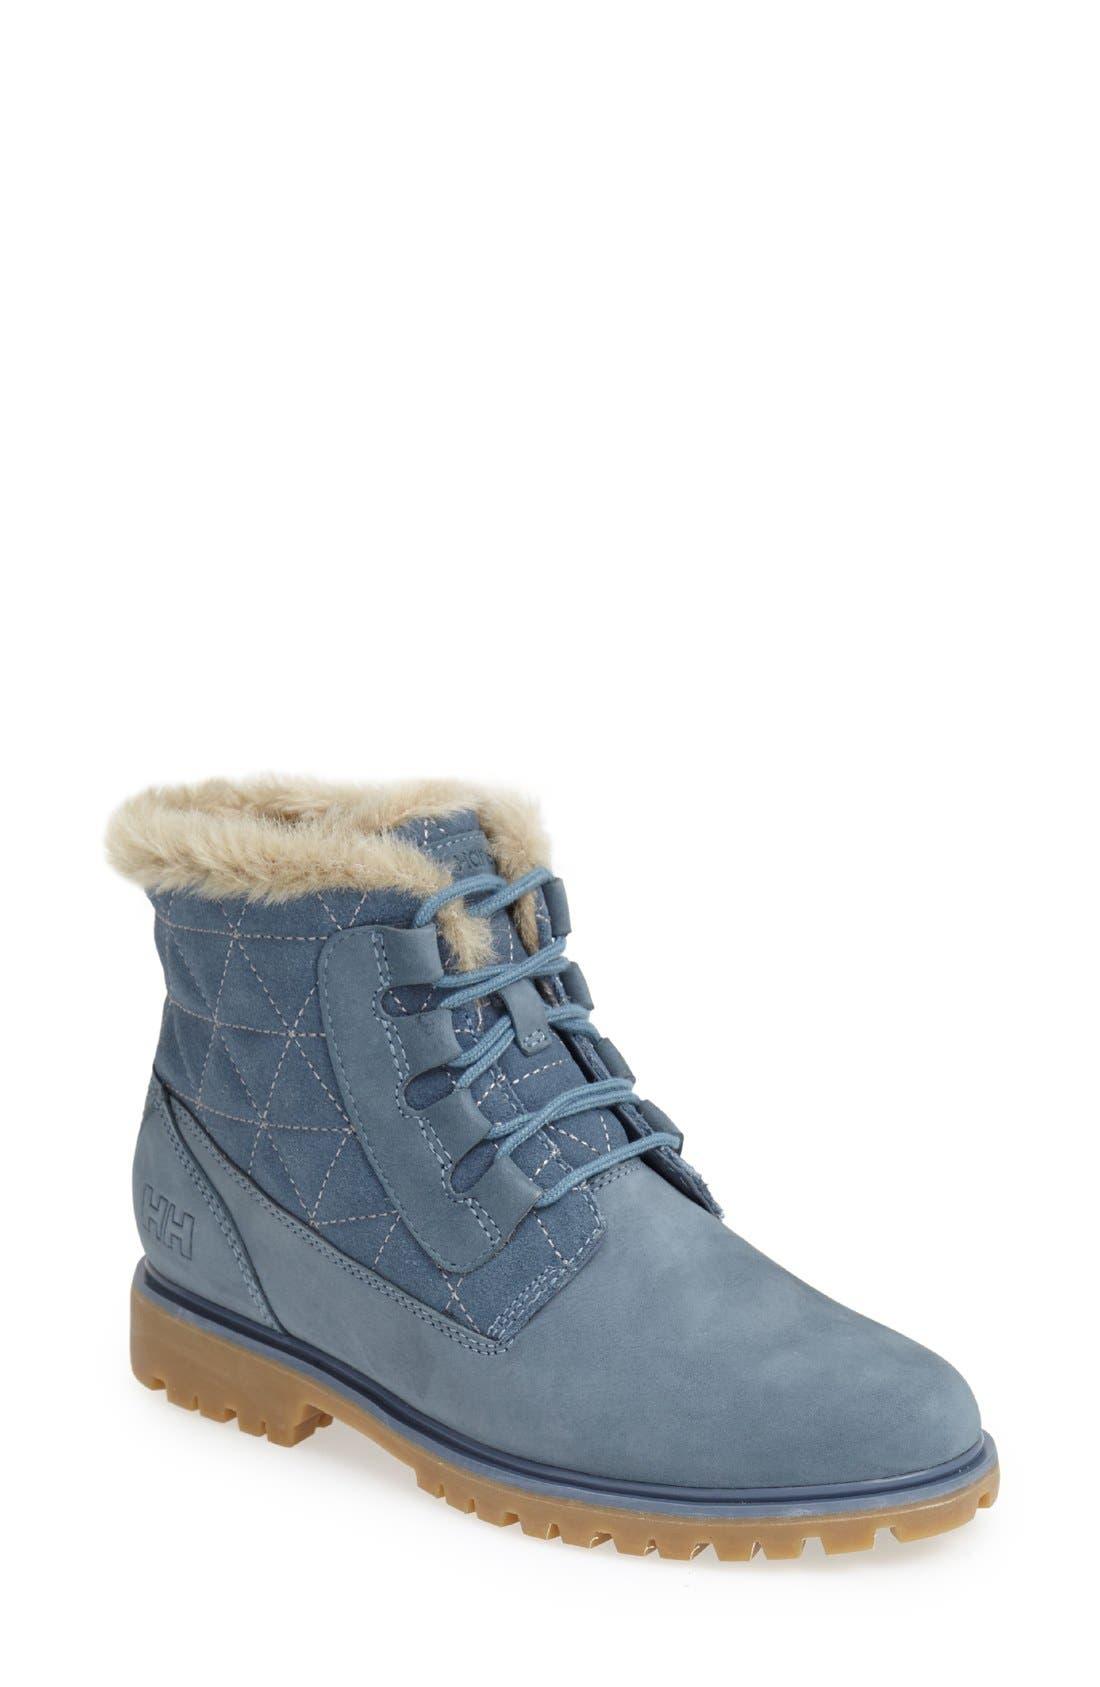 'Vega' Waterproof Leather Boot,                             Main thumbnail 1, color,                             Arctic Blue/ Natural